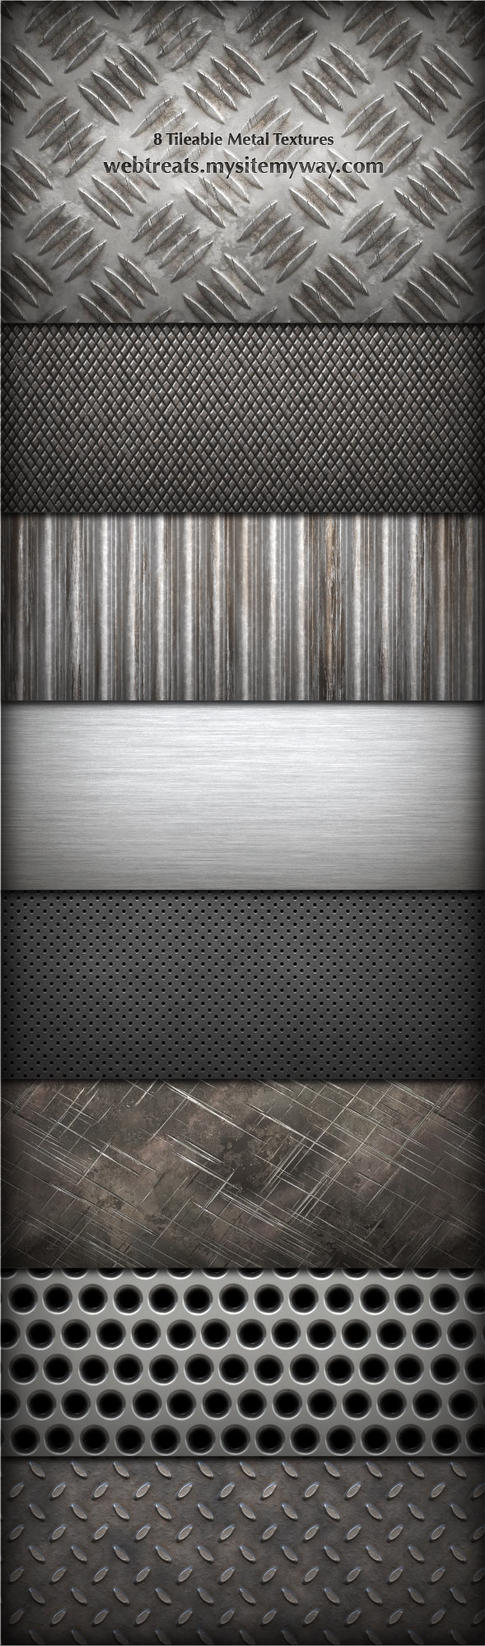 8 Tileable Metal Textures by WebTreatsETC